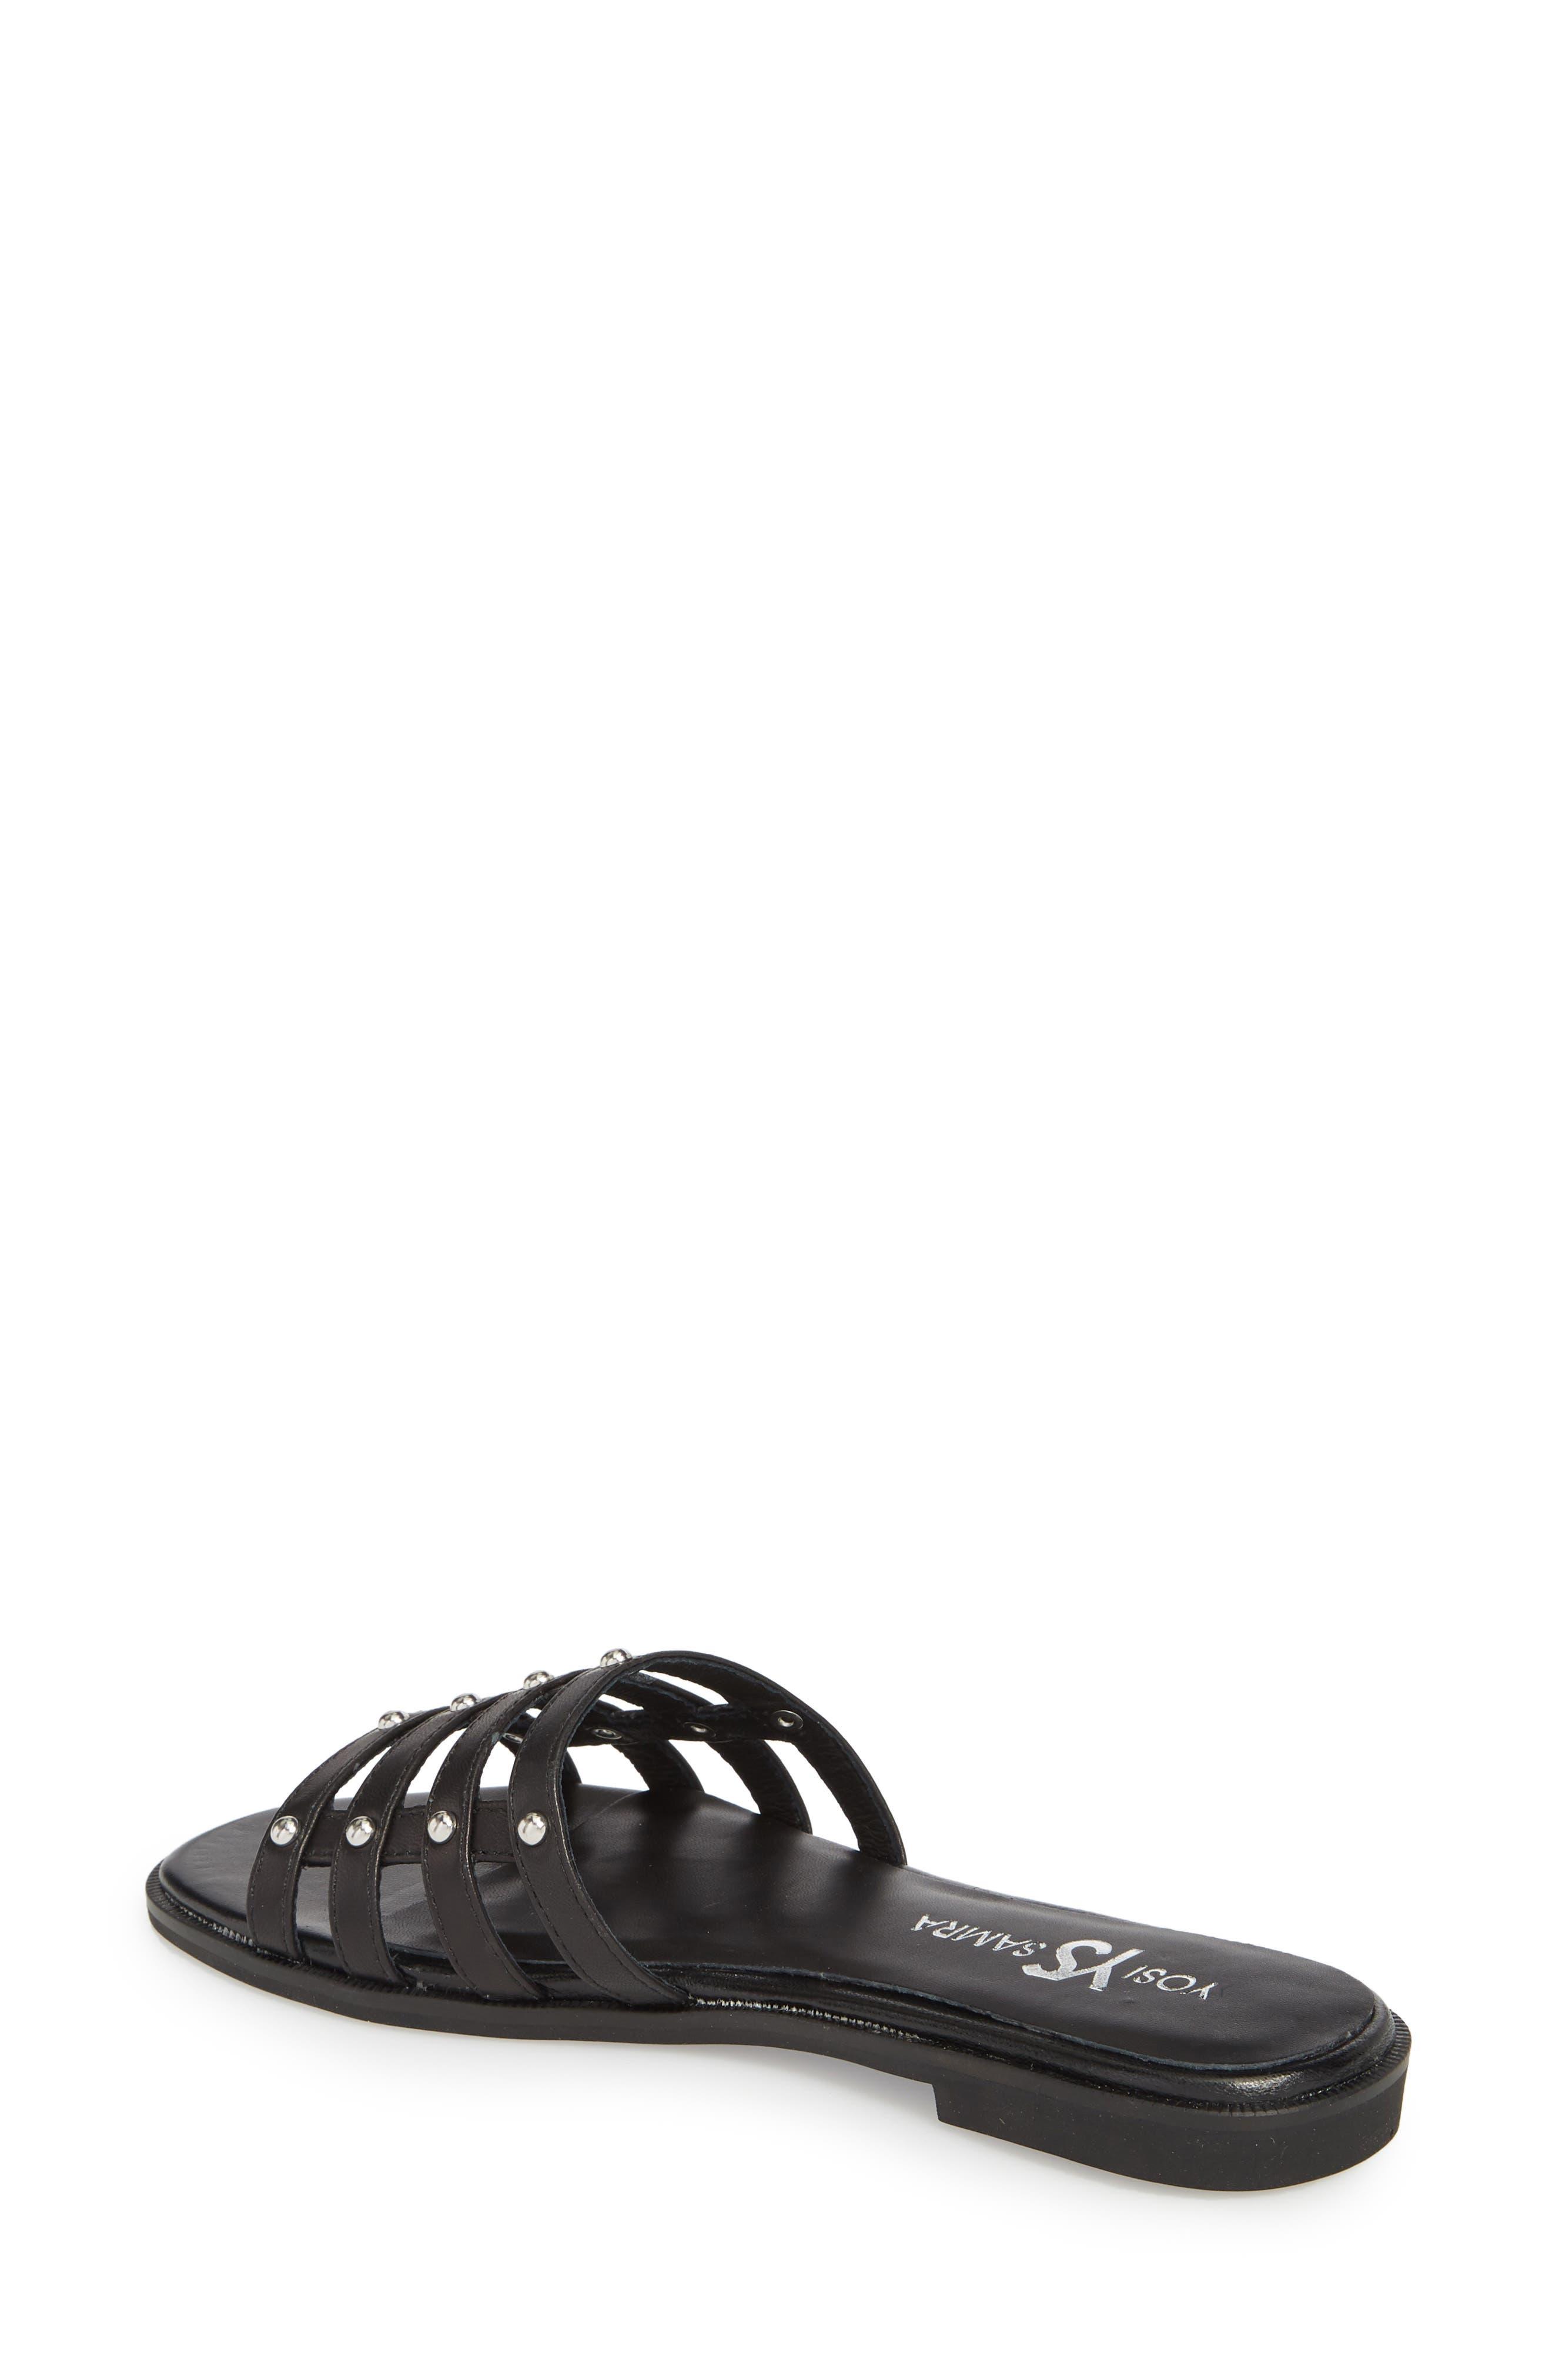 Cara Slide Sandal,                             Alternate thumbnail 2, color,                             Black/ Silver Studs